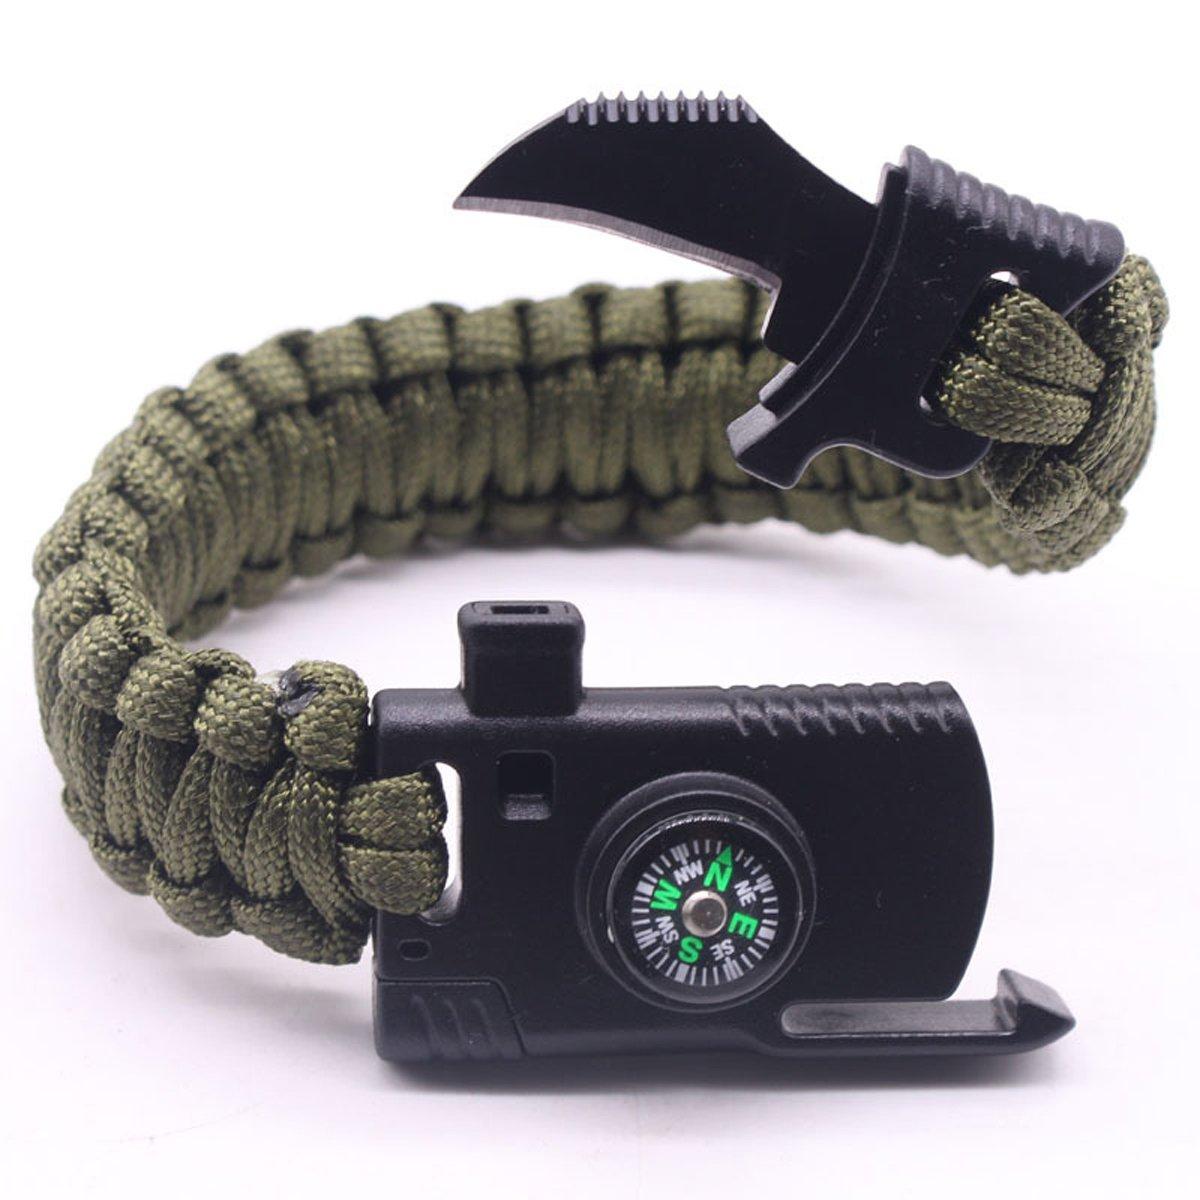 Image of Knife Multi Tool Survival Bracelet, 3 Sizes